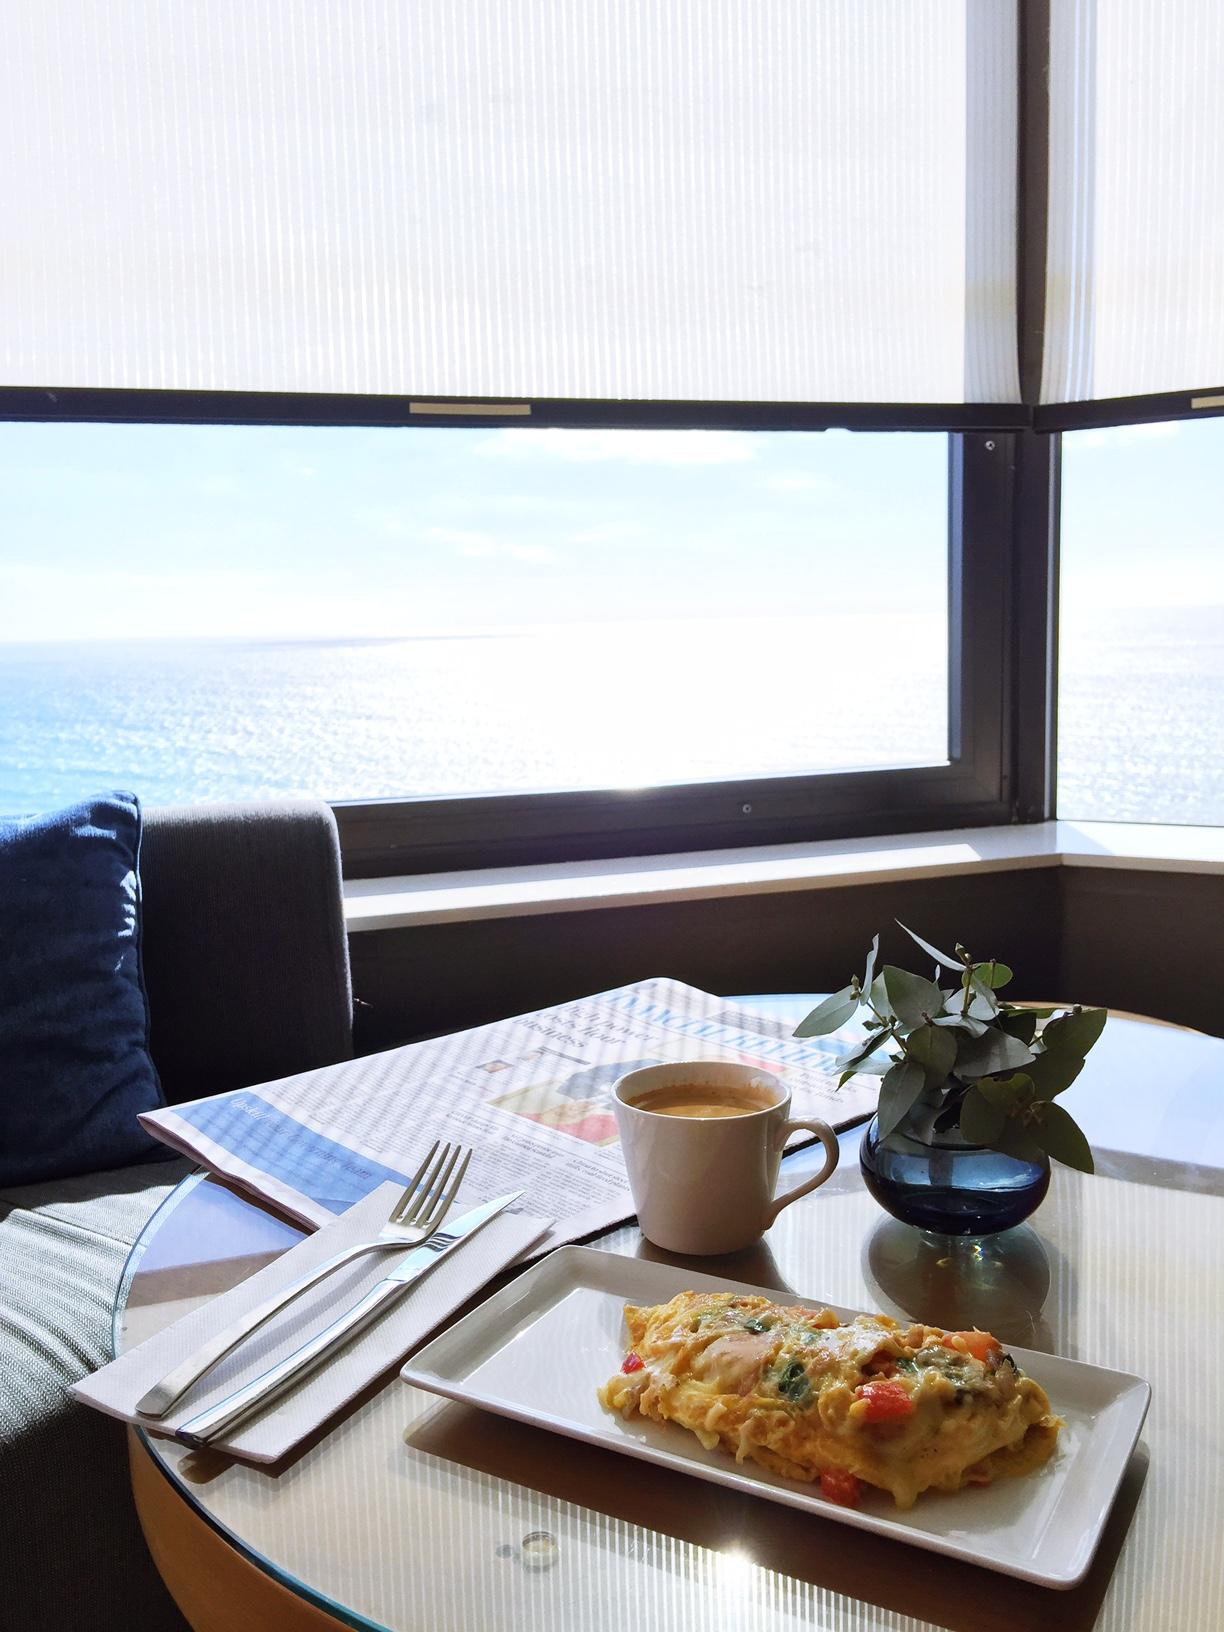 surfers paradise marriott resort and spa gold coast australia beach honeymoon romantic couples holiday luxury vacation hotel review marriott club lounge breakfast